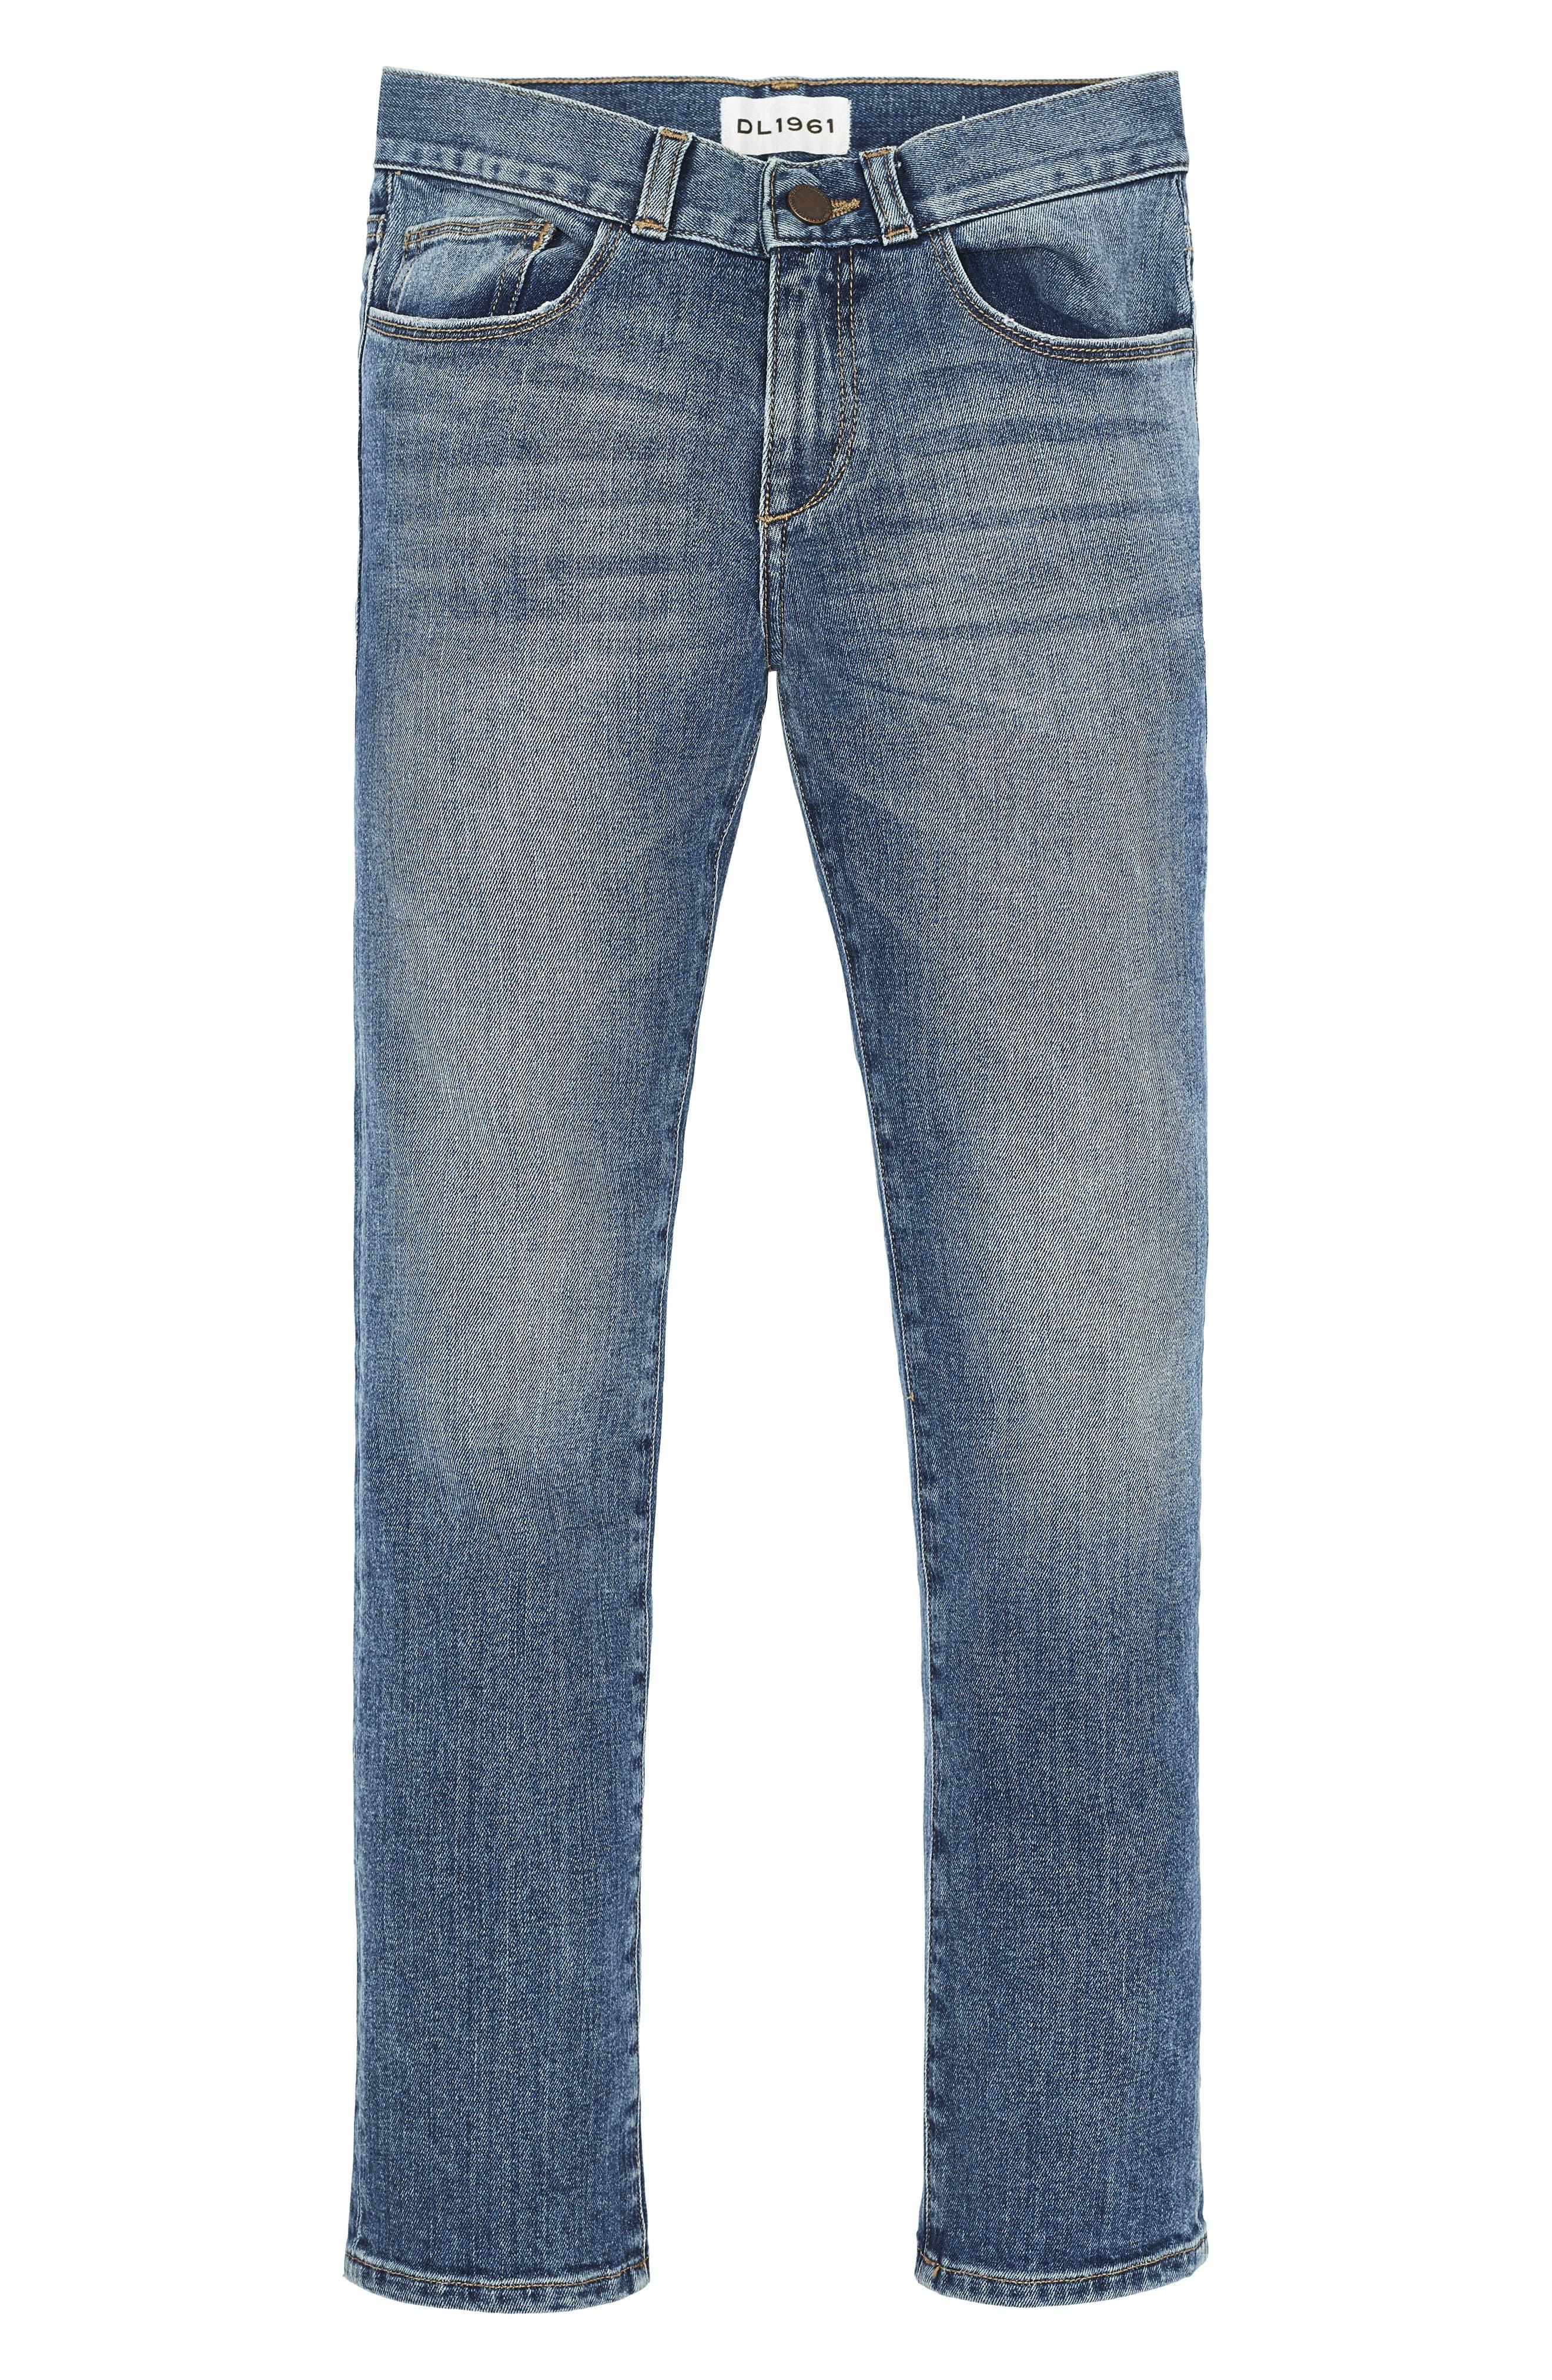 Hawke Skinny Jeans,                             Main thumbnail 1, color,                             Aesthetic